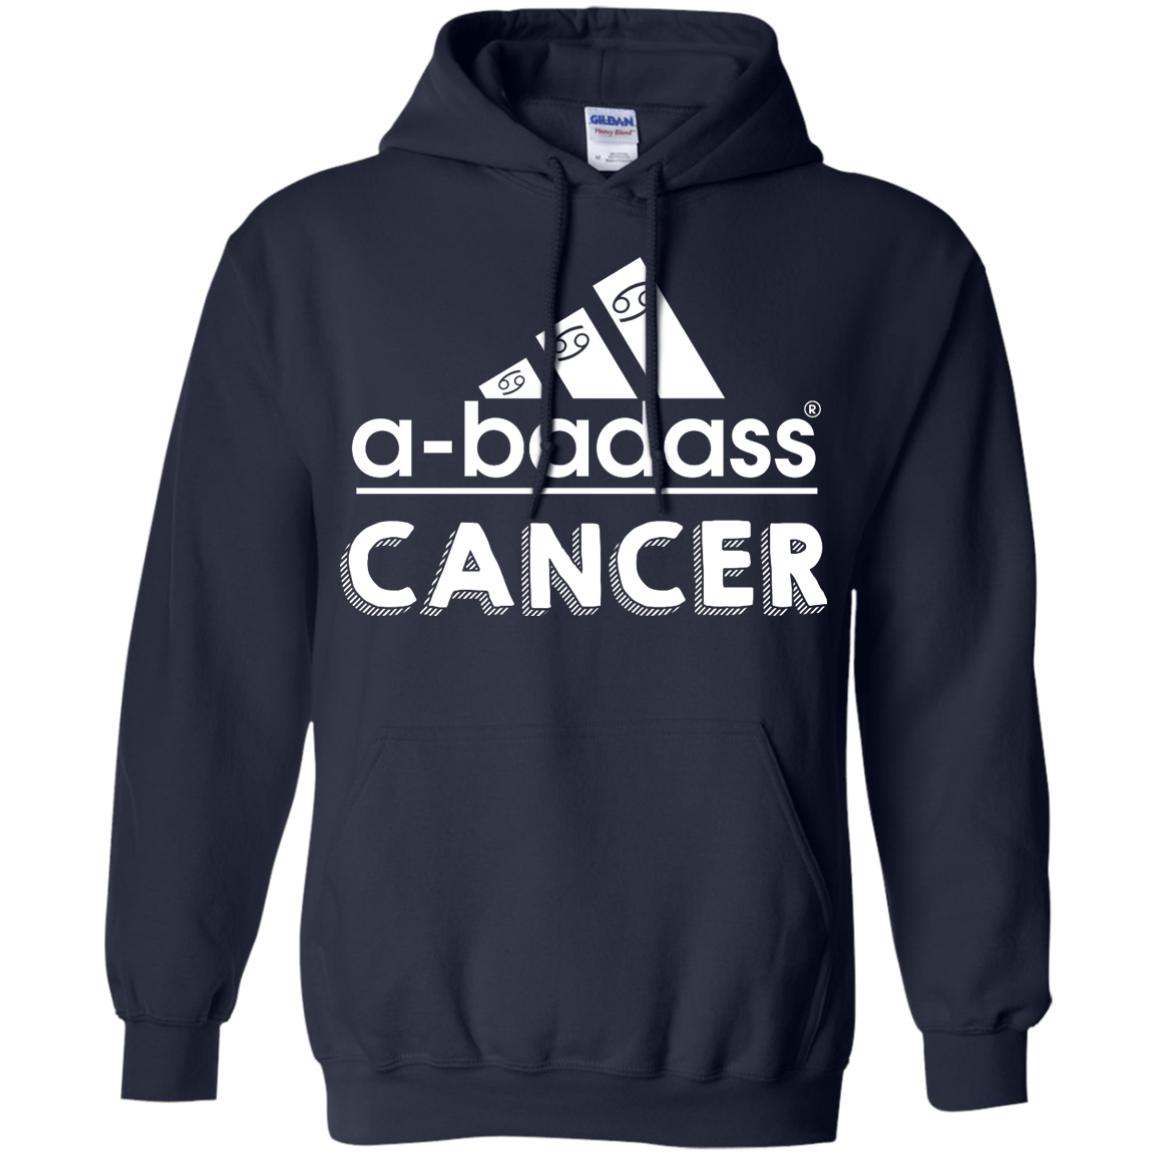 Cancer hoodies